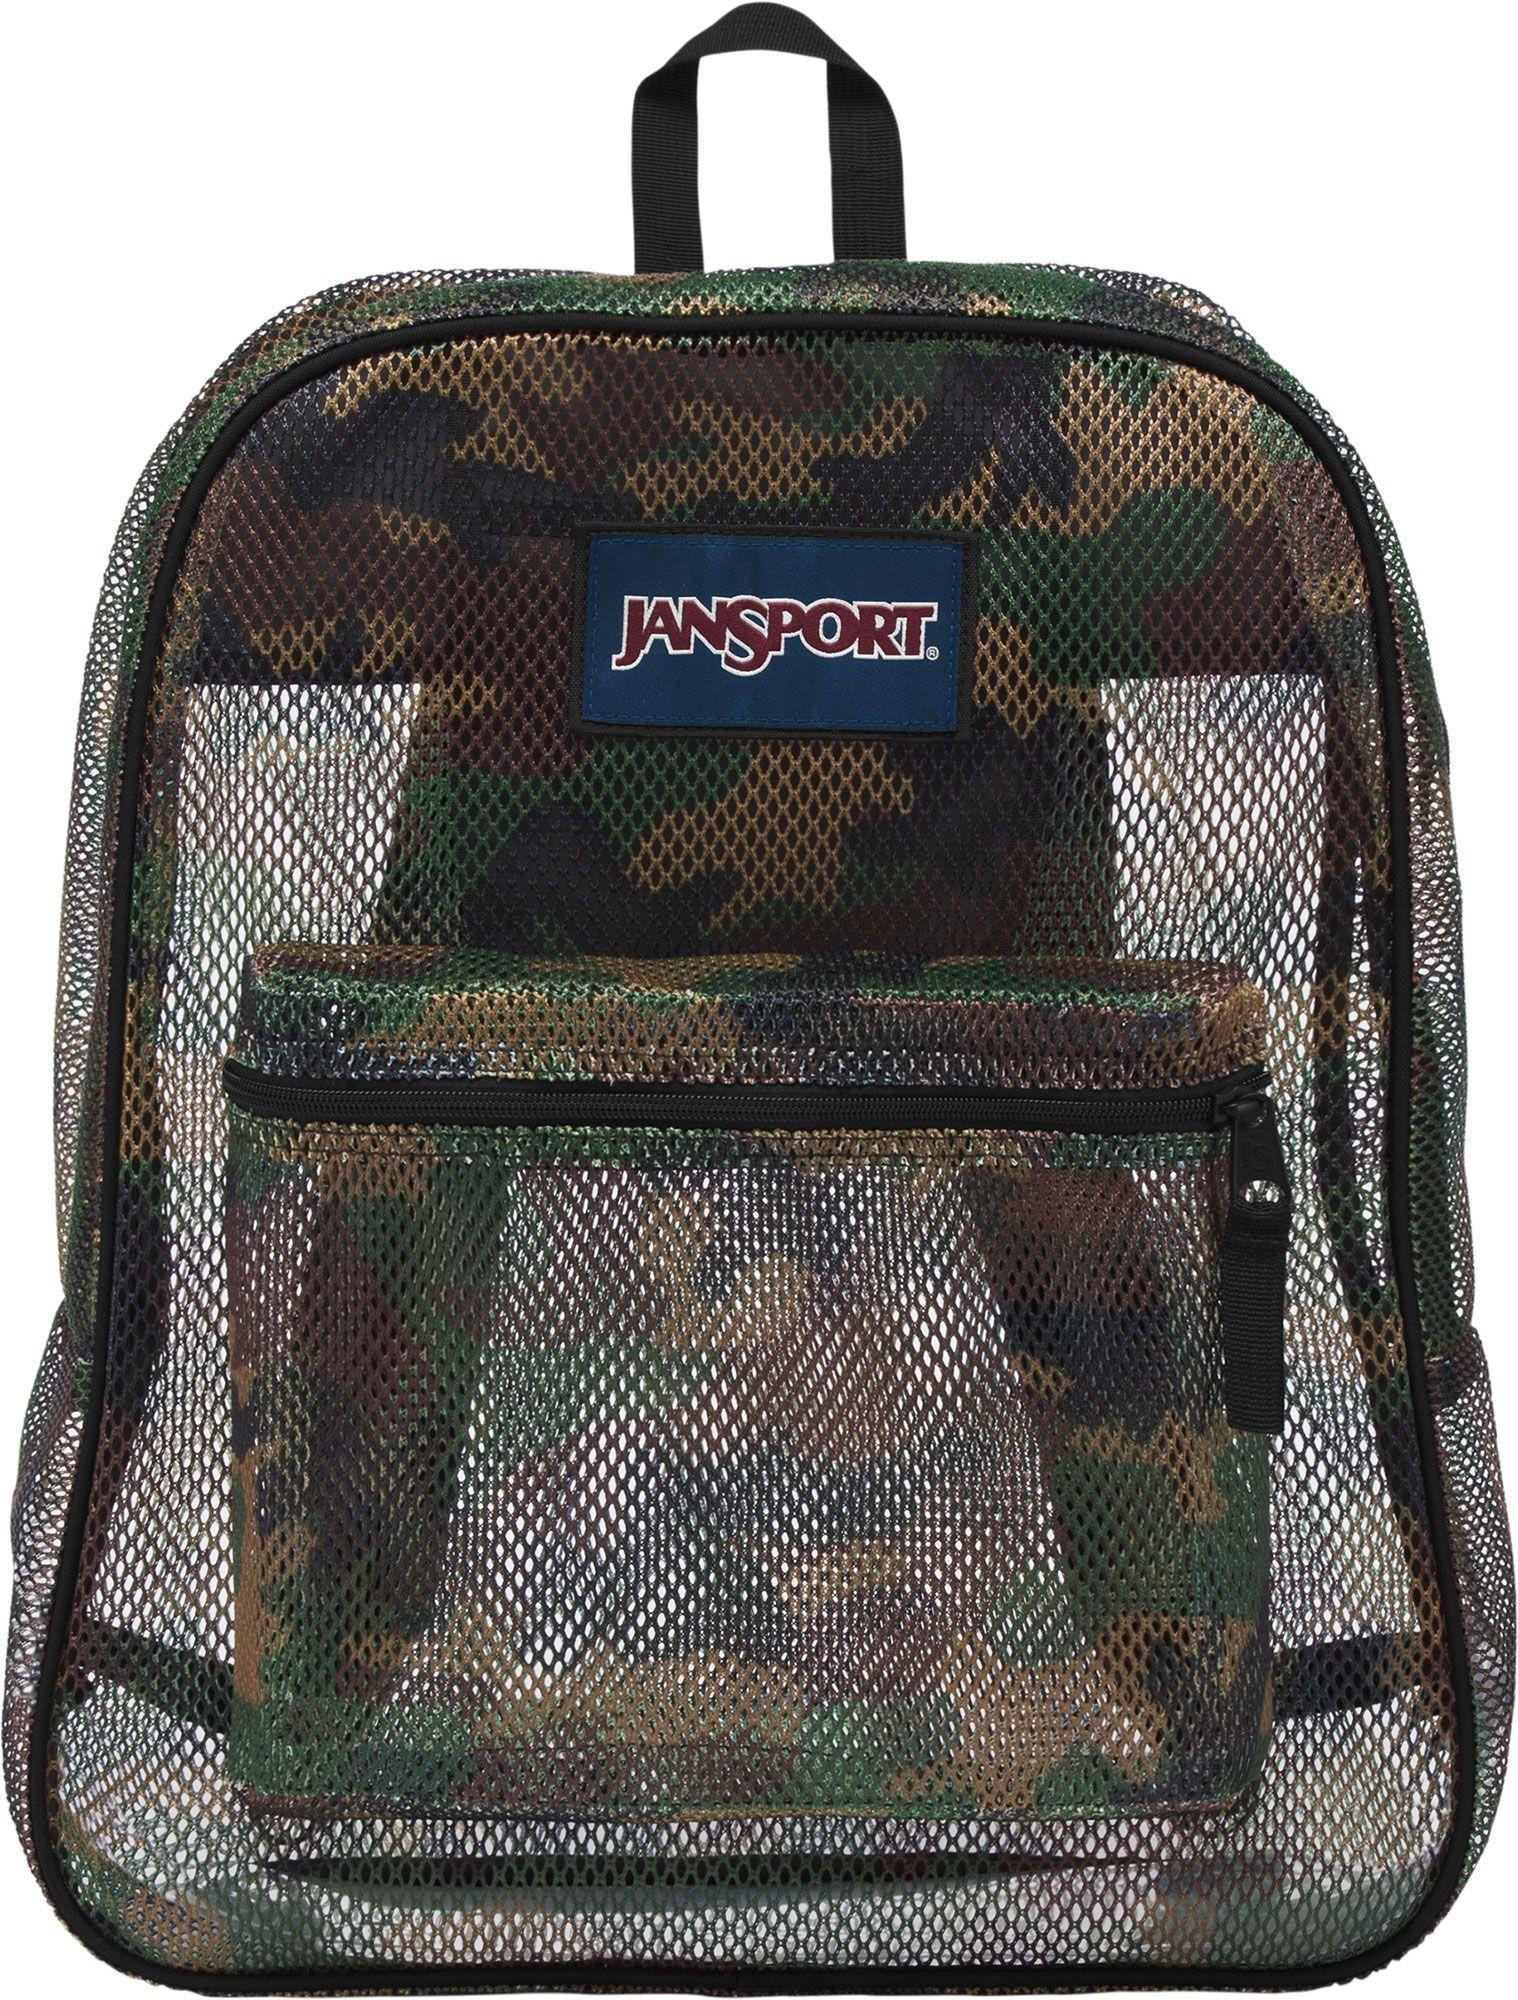 585bf03c21db Jansport Mesh Pack Backpack- Fenix Toulouse Handball